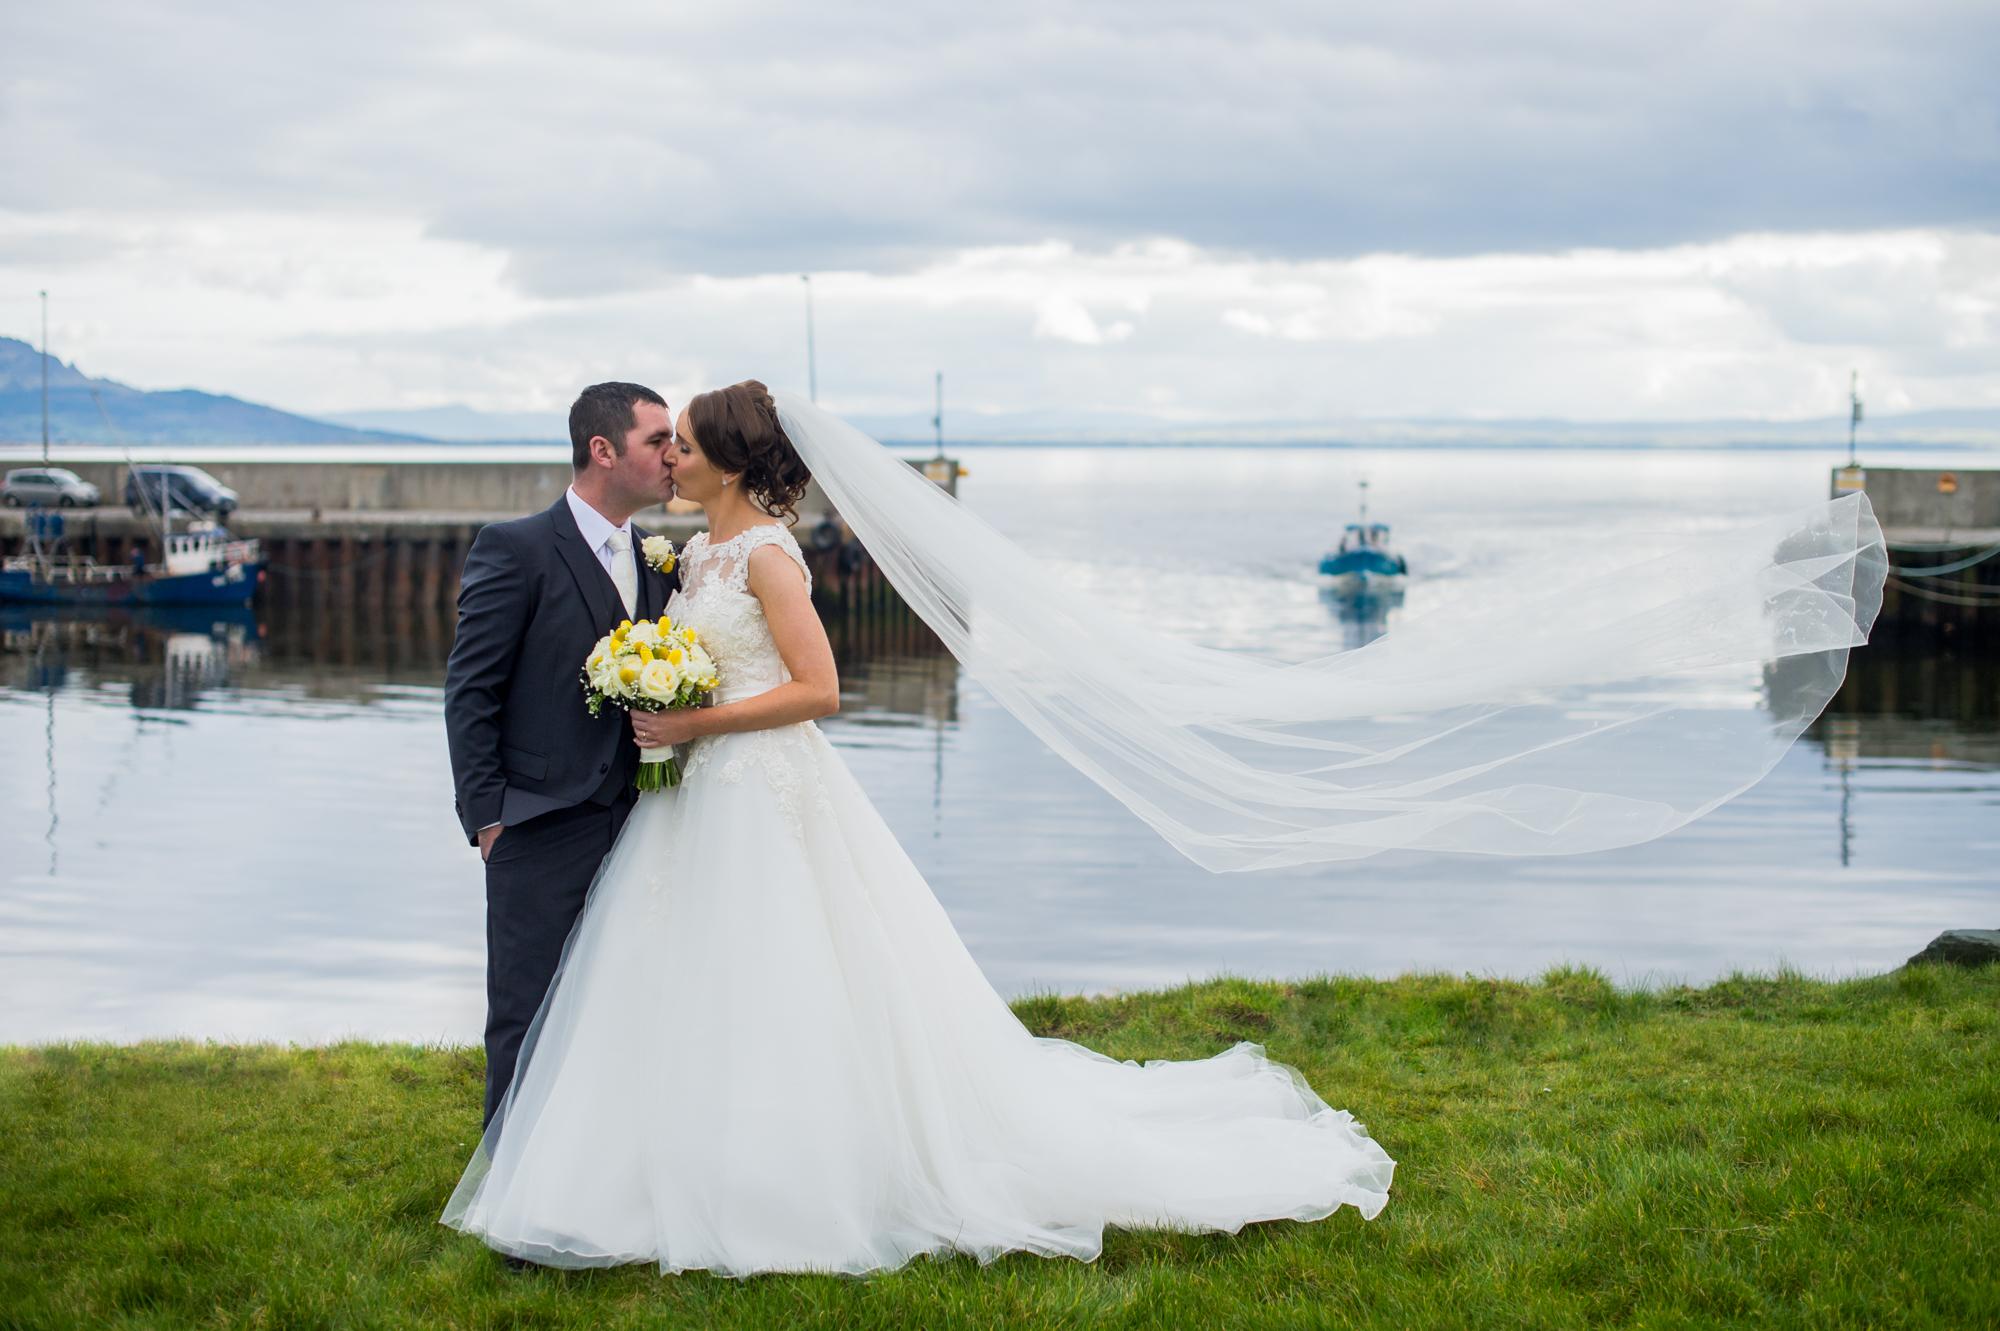 Michael_Gill_Photography_Wedding_Greencastle_Lousie_Jason_Donegal-13.jpg